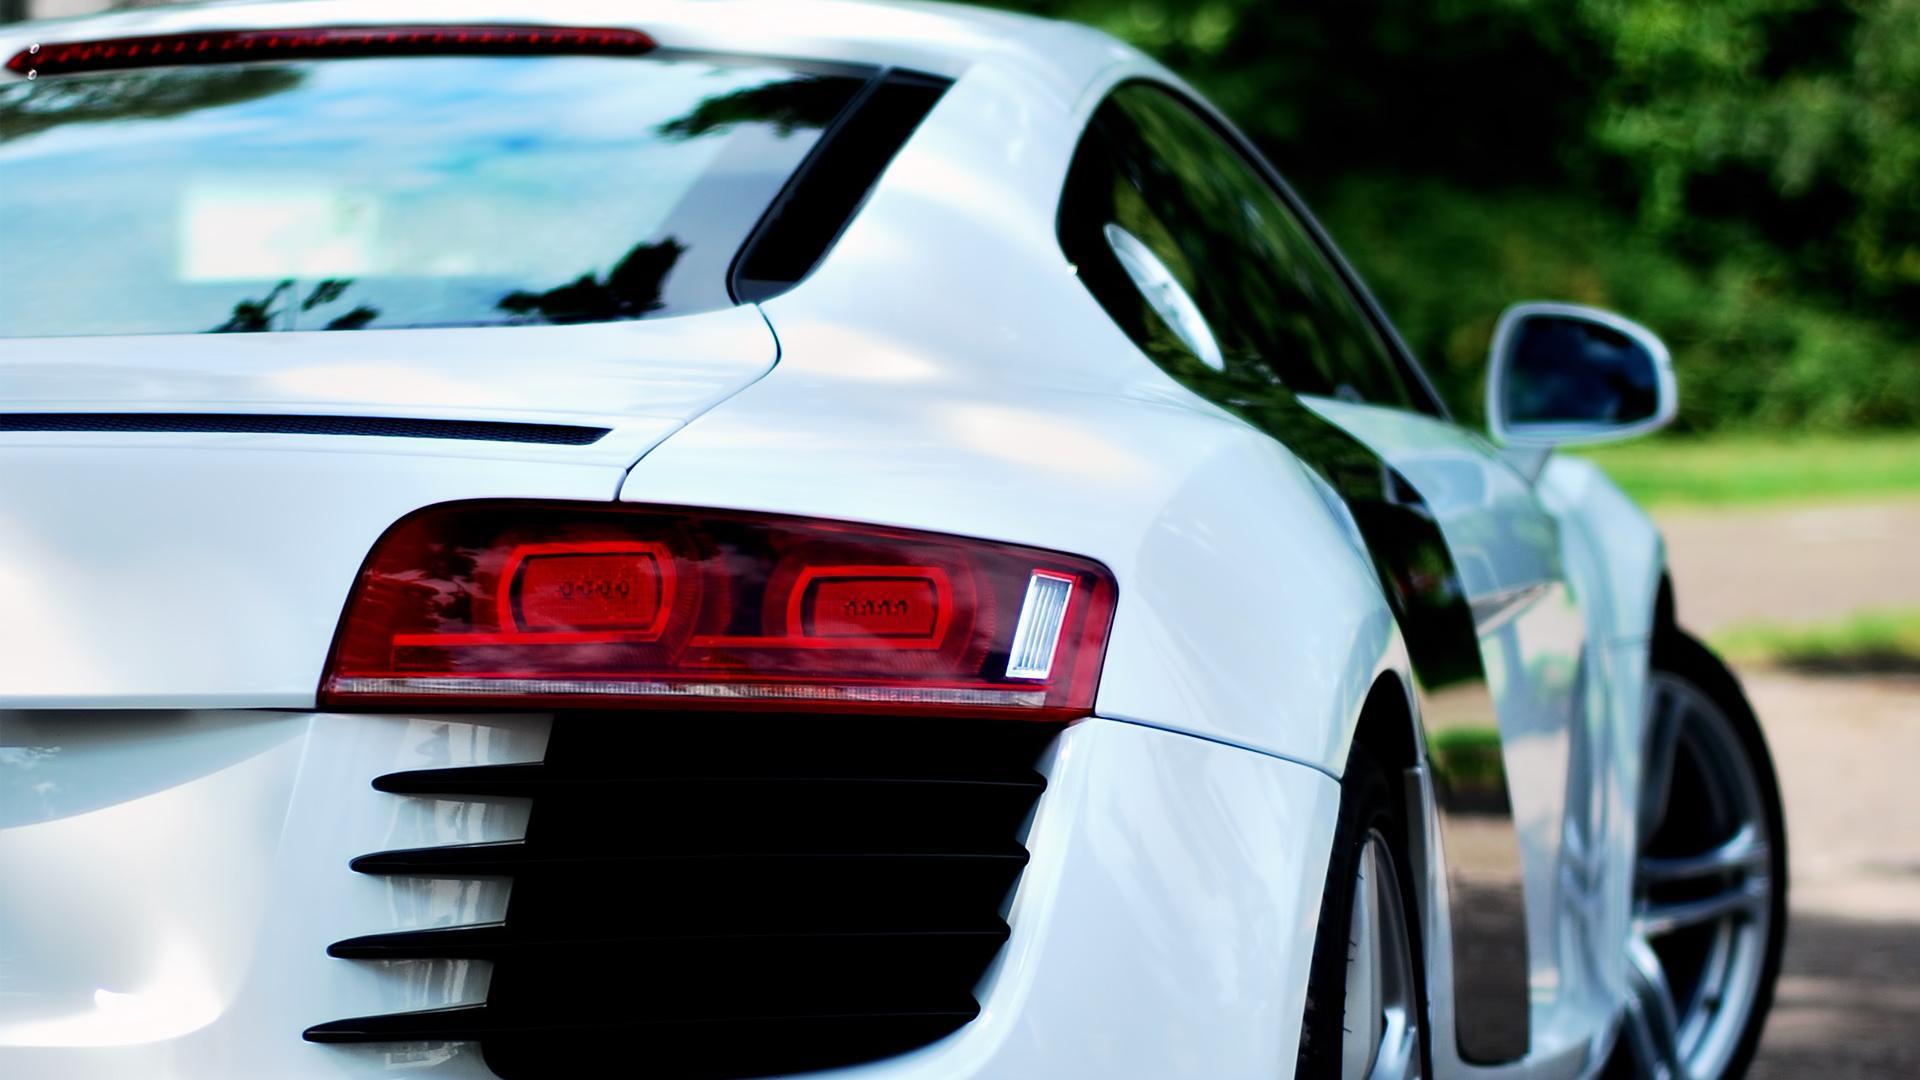 Audi ауди r8 фара автомобили машины